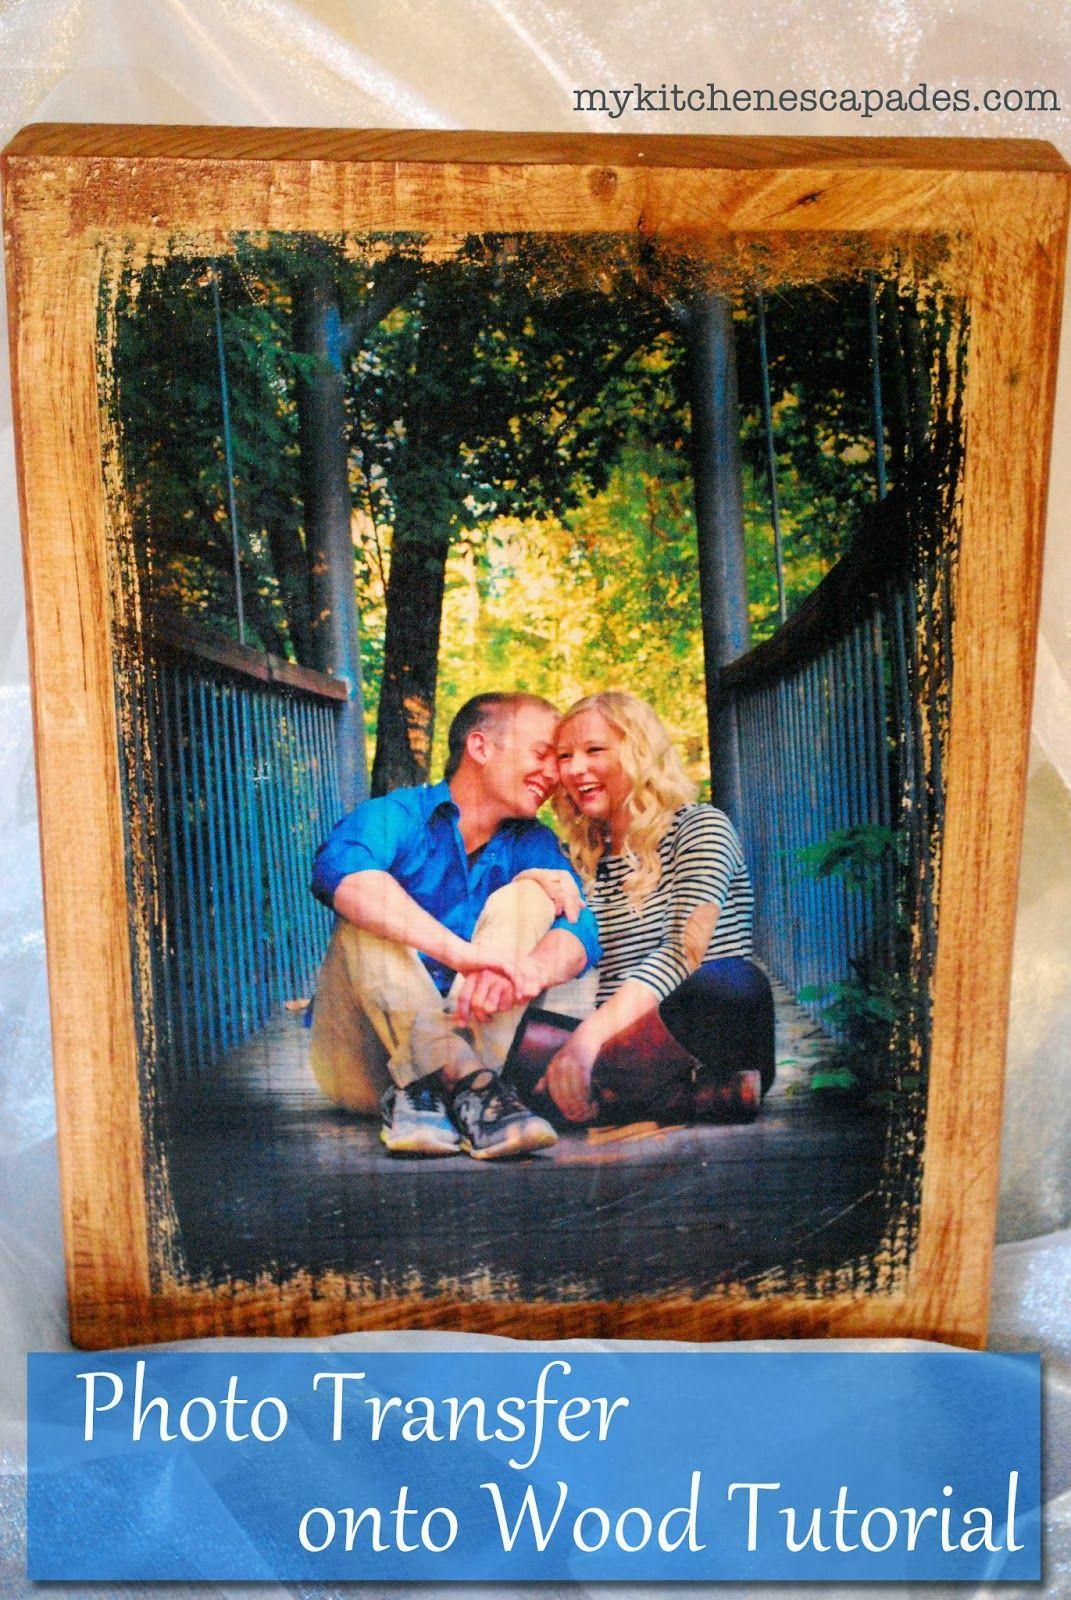 wood photo transfer on pinterest canvas photo transfer photo transfer and wood transfer. Black Bedroom Furniture Sets. Home Design Ideas